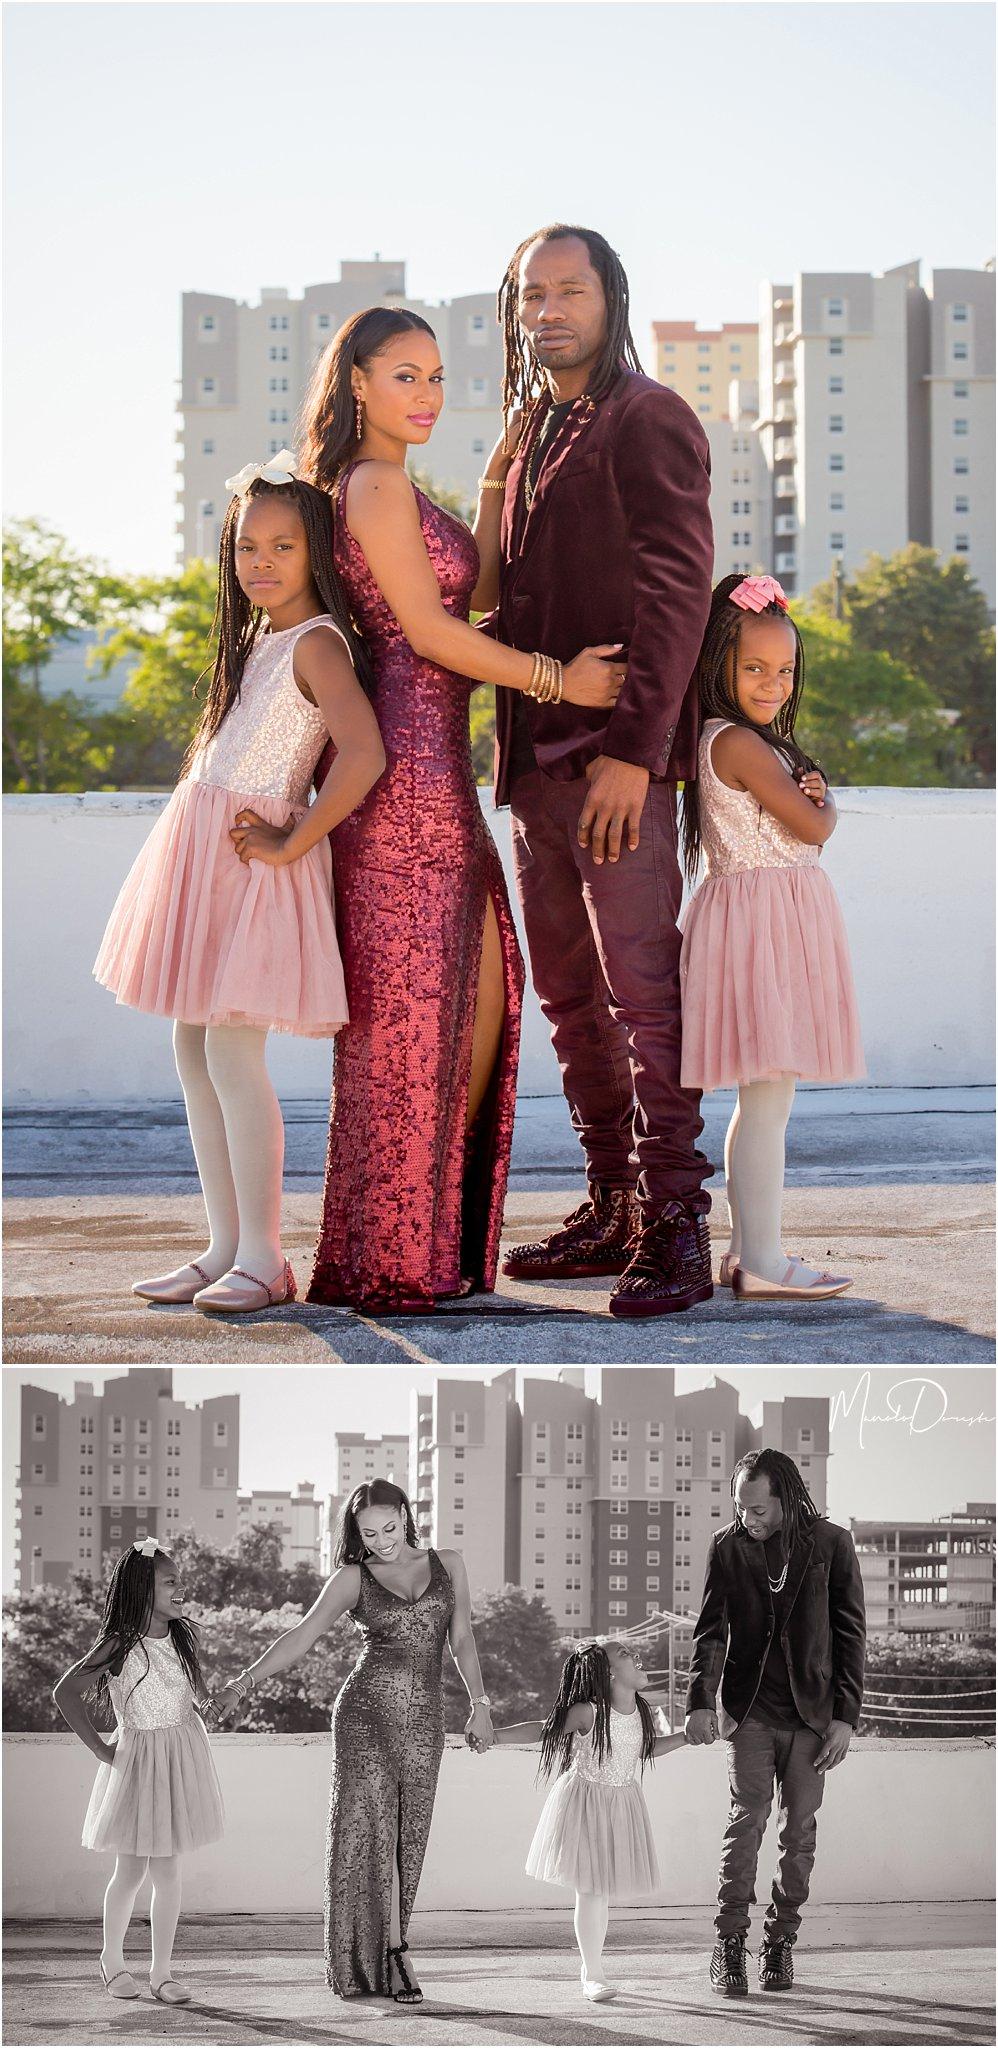 01011_ManoloDoreste_InFocusStudios_Wedding_Family_Photography_Miami_MiamiPhotographer.jpg